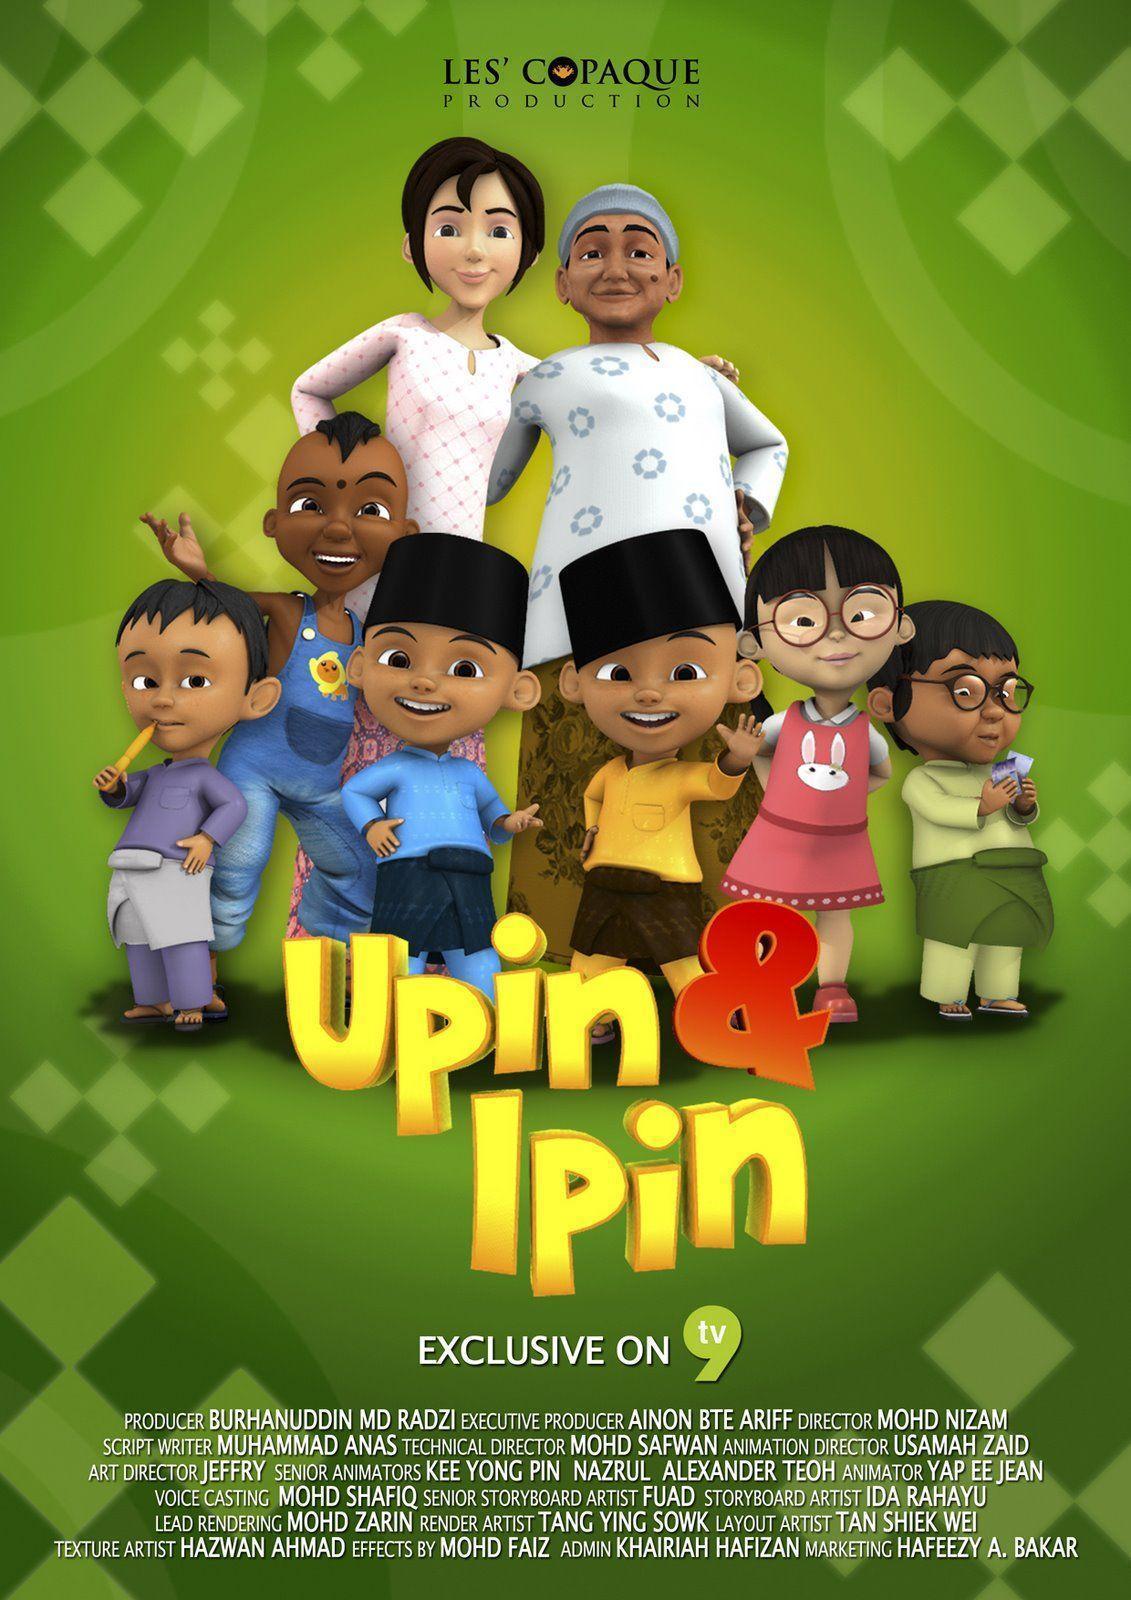 Upin & Ipin Wallpapers - Wallpaper Cave